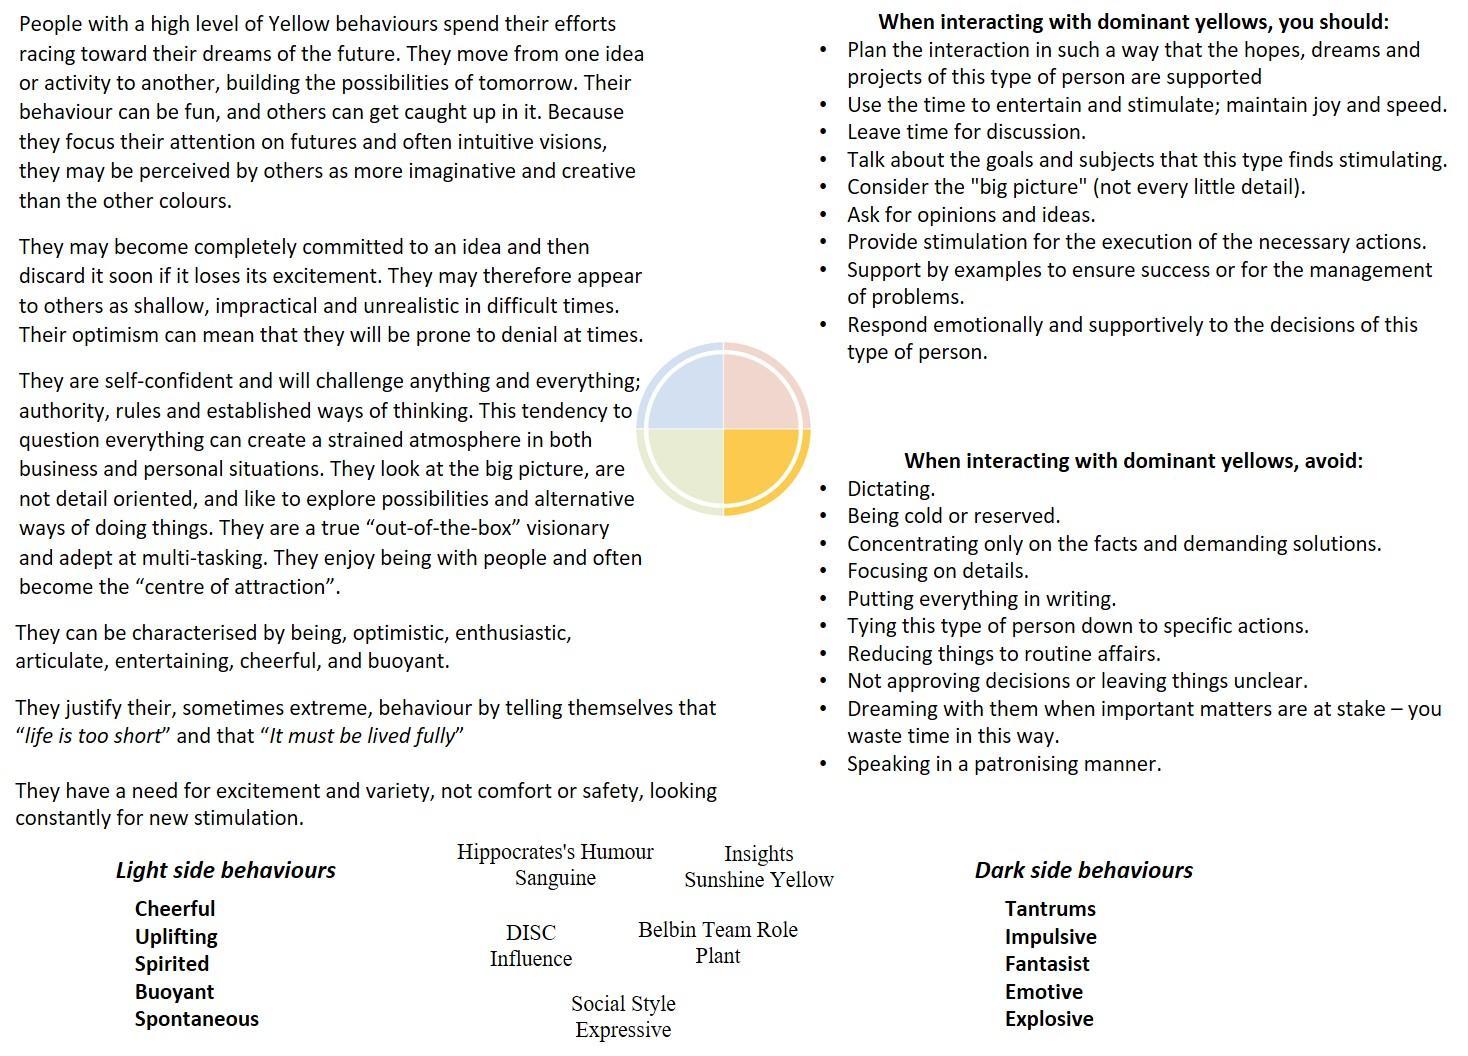 Monochrome Leadership 2